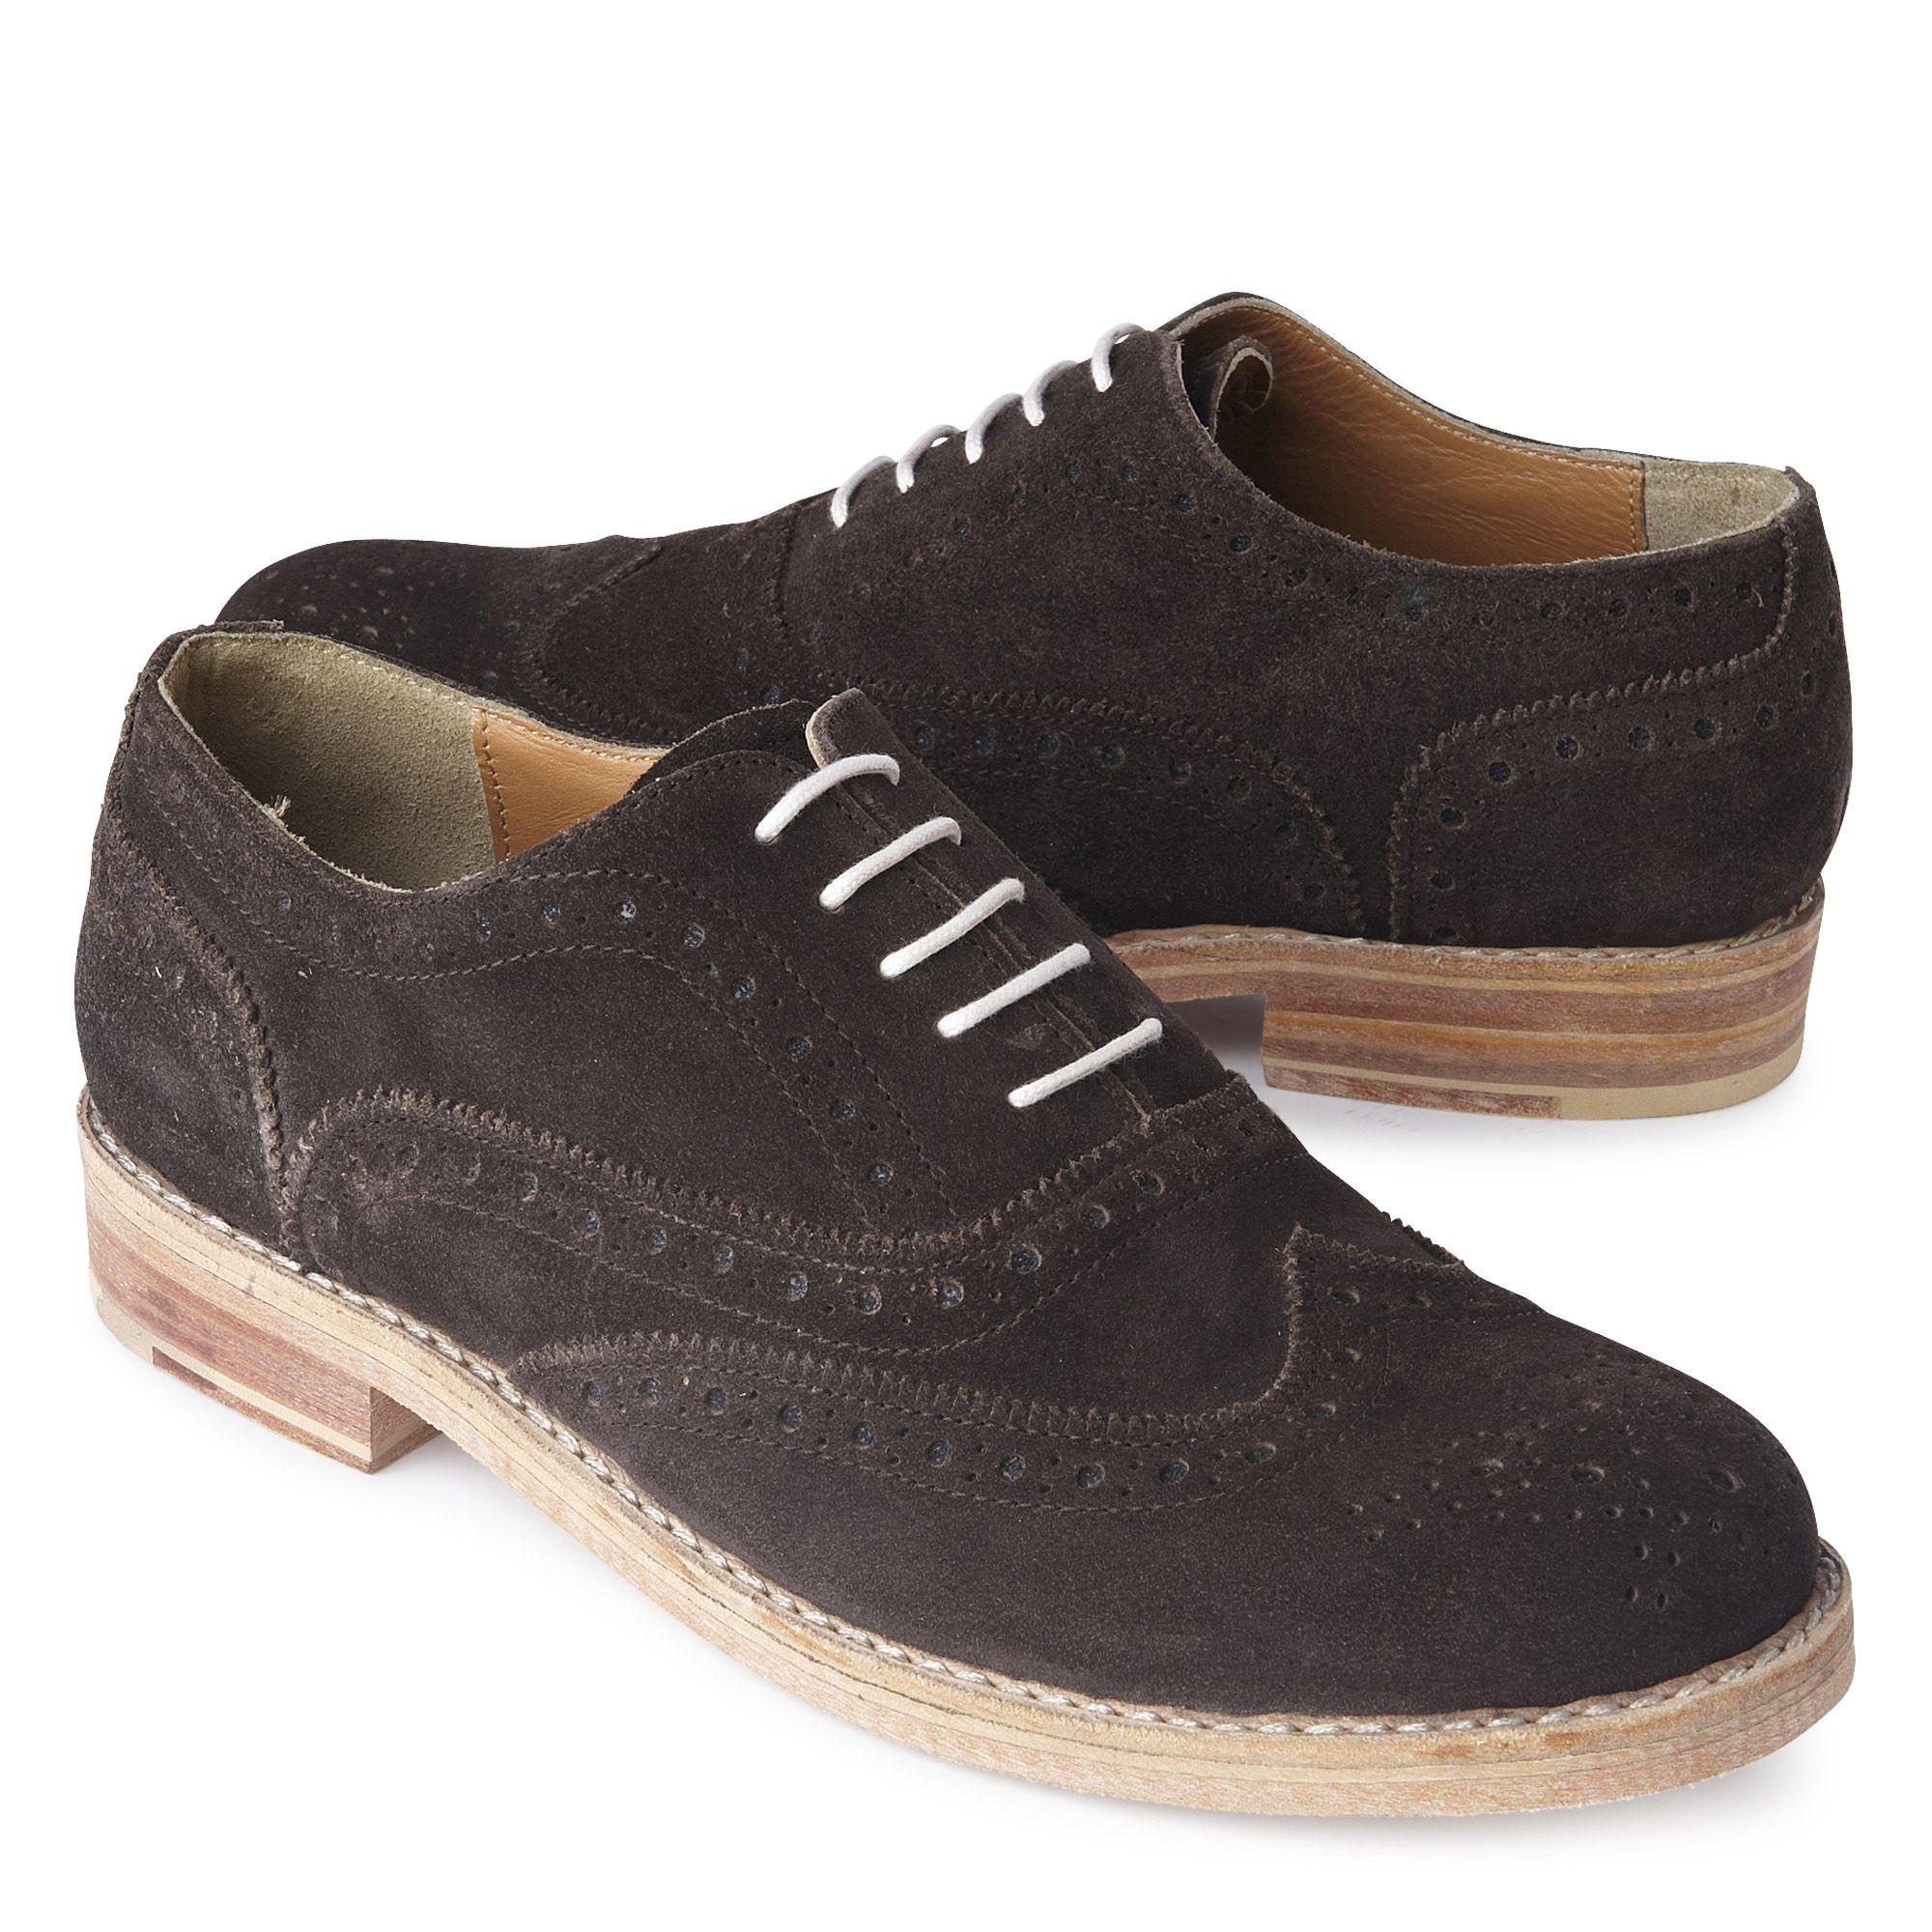 https://cdnb.lystit.com/photos/2011/05/04/kg-by-kurt-geiger-brown-saint-brogue-shoes-brown-product-1-427877-526203946.jpeg